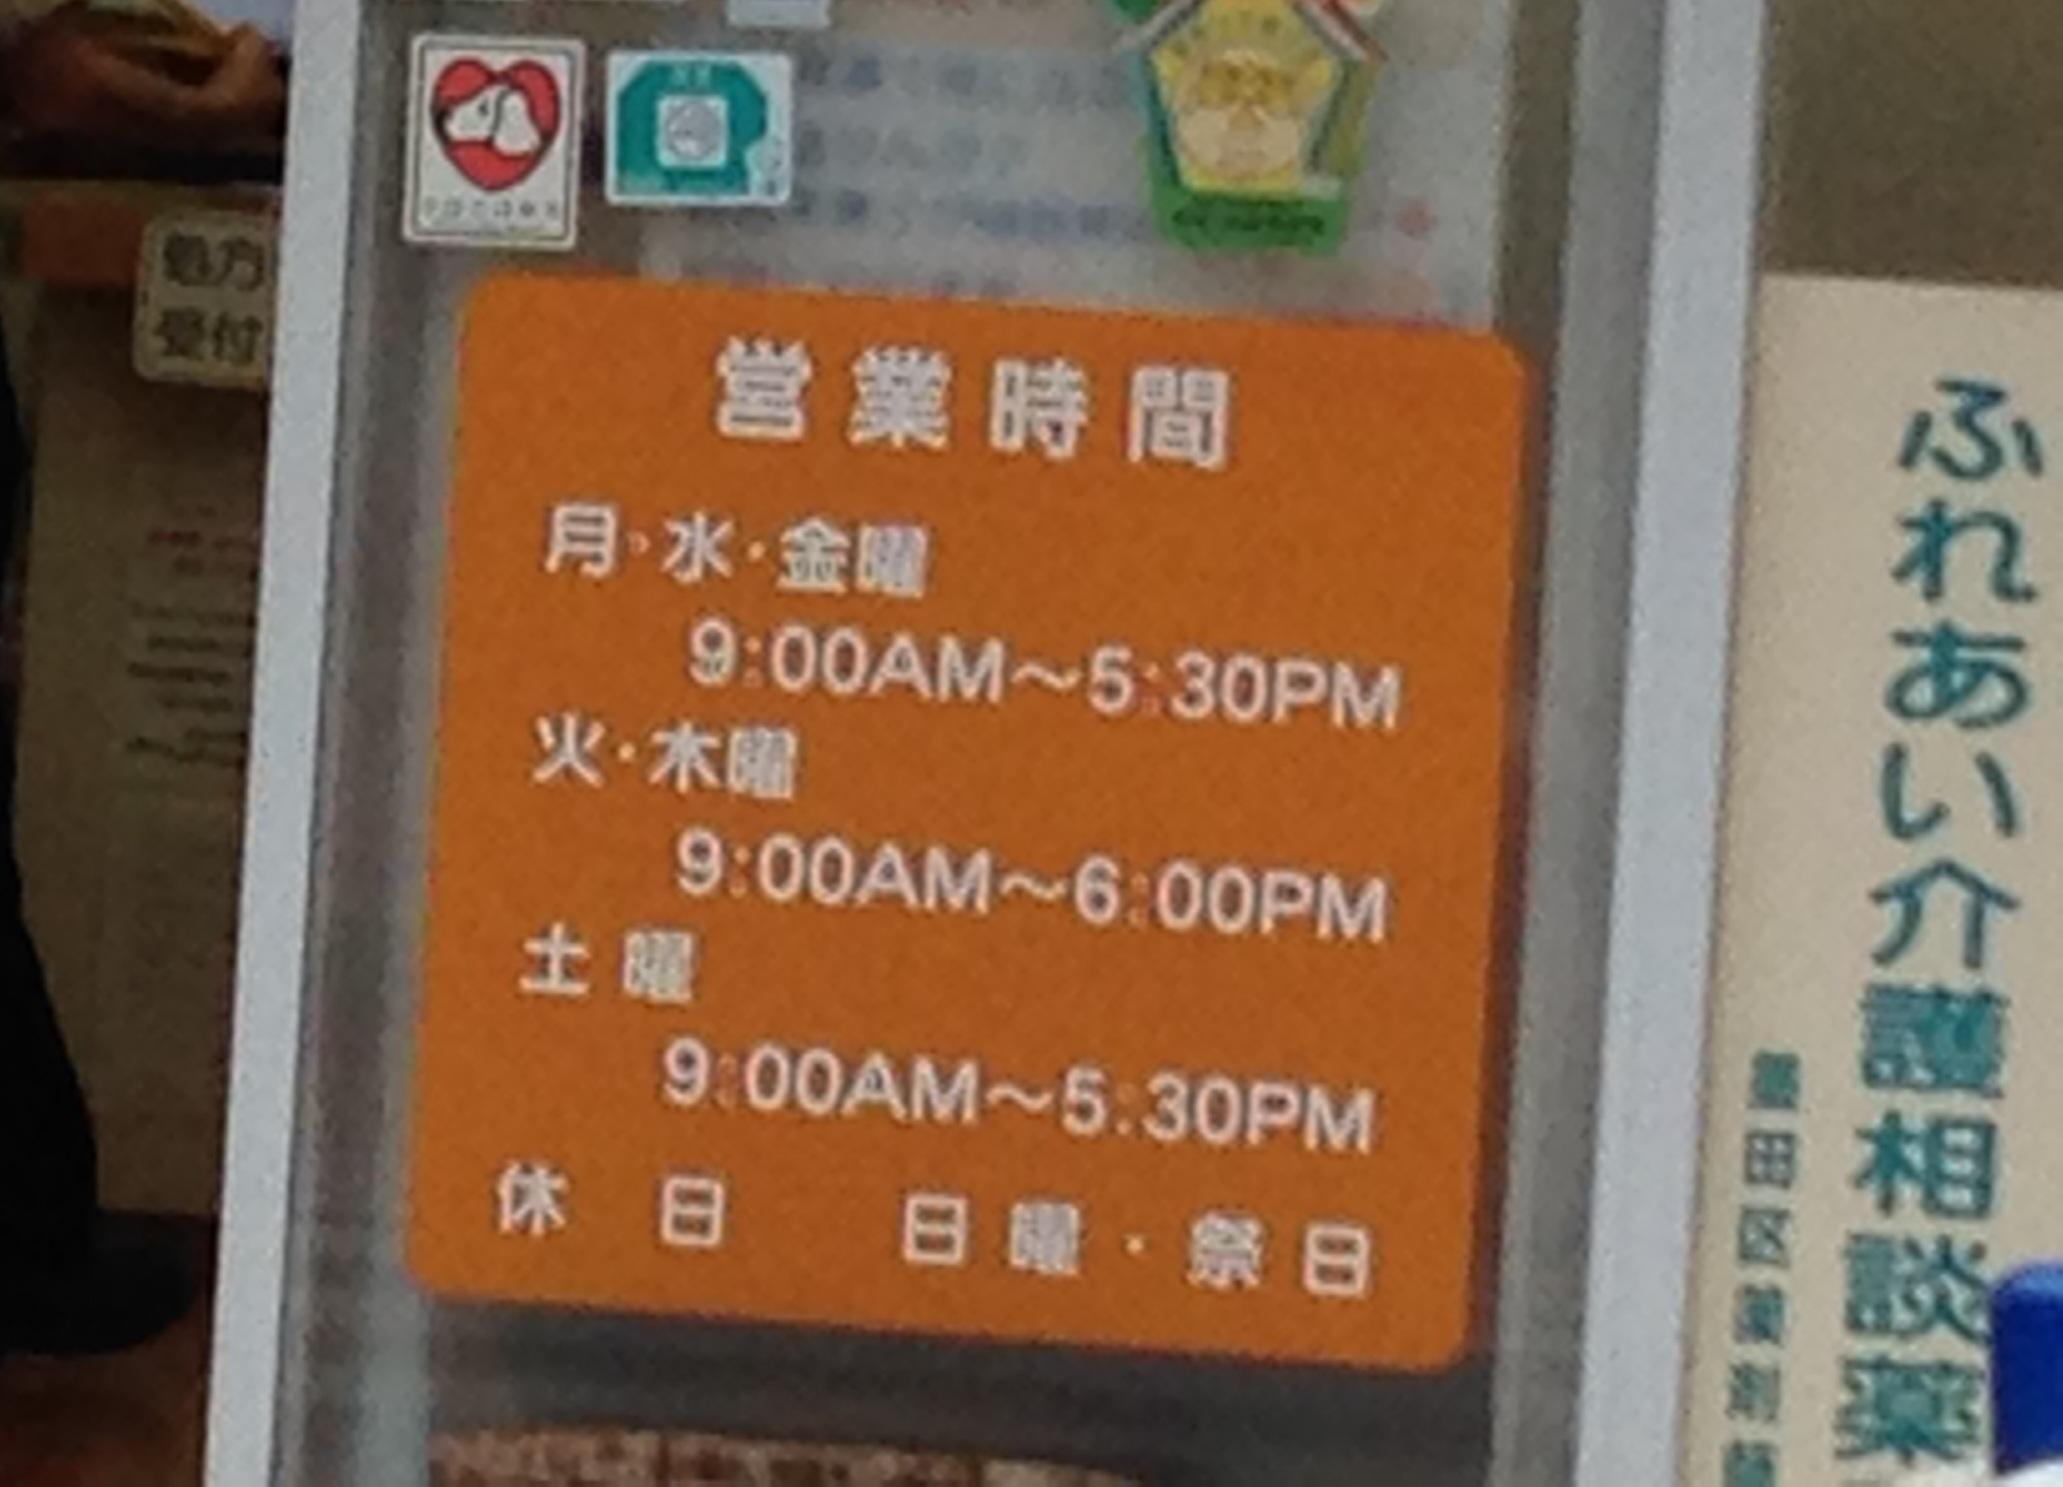 MEGAドン・キホーテ仙台台原店の店舗情報・WEBチラシ|驚安の殿堂 ドン・キホーテ